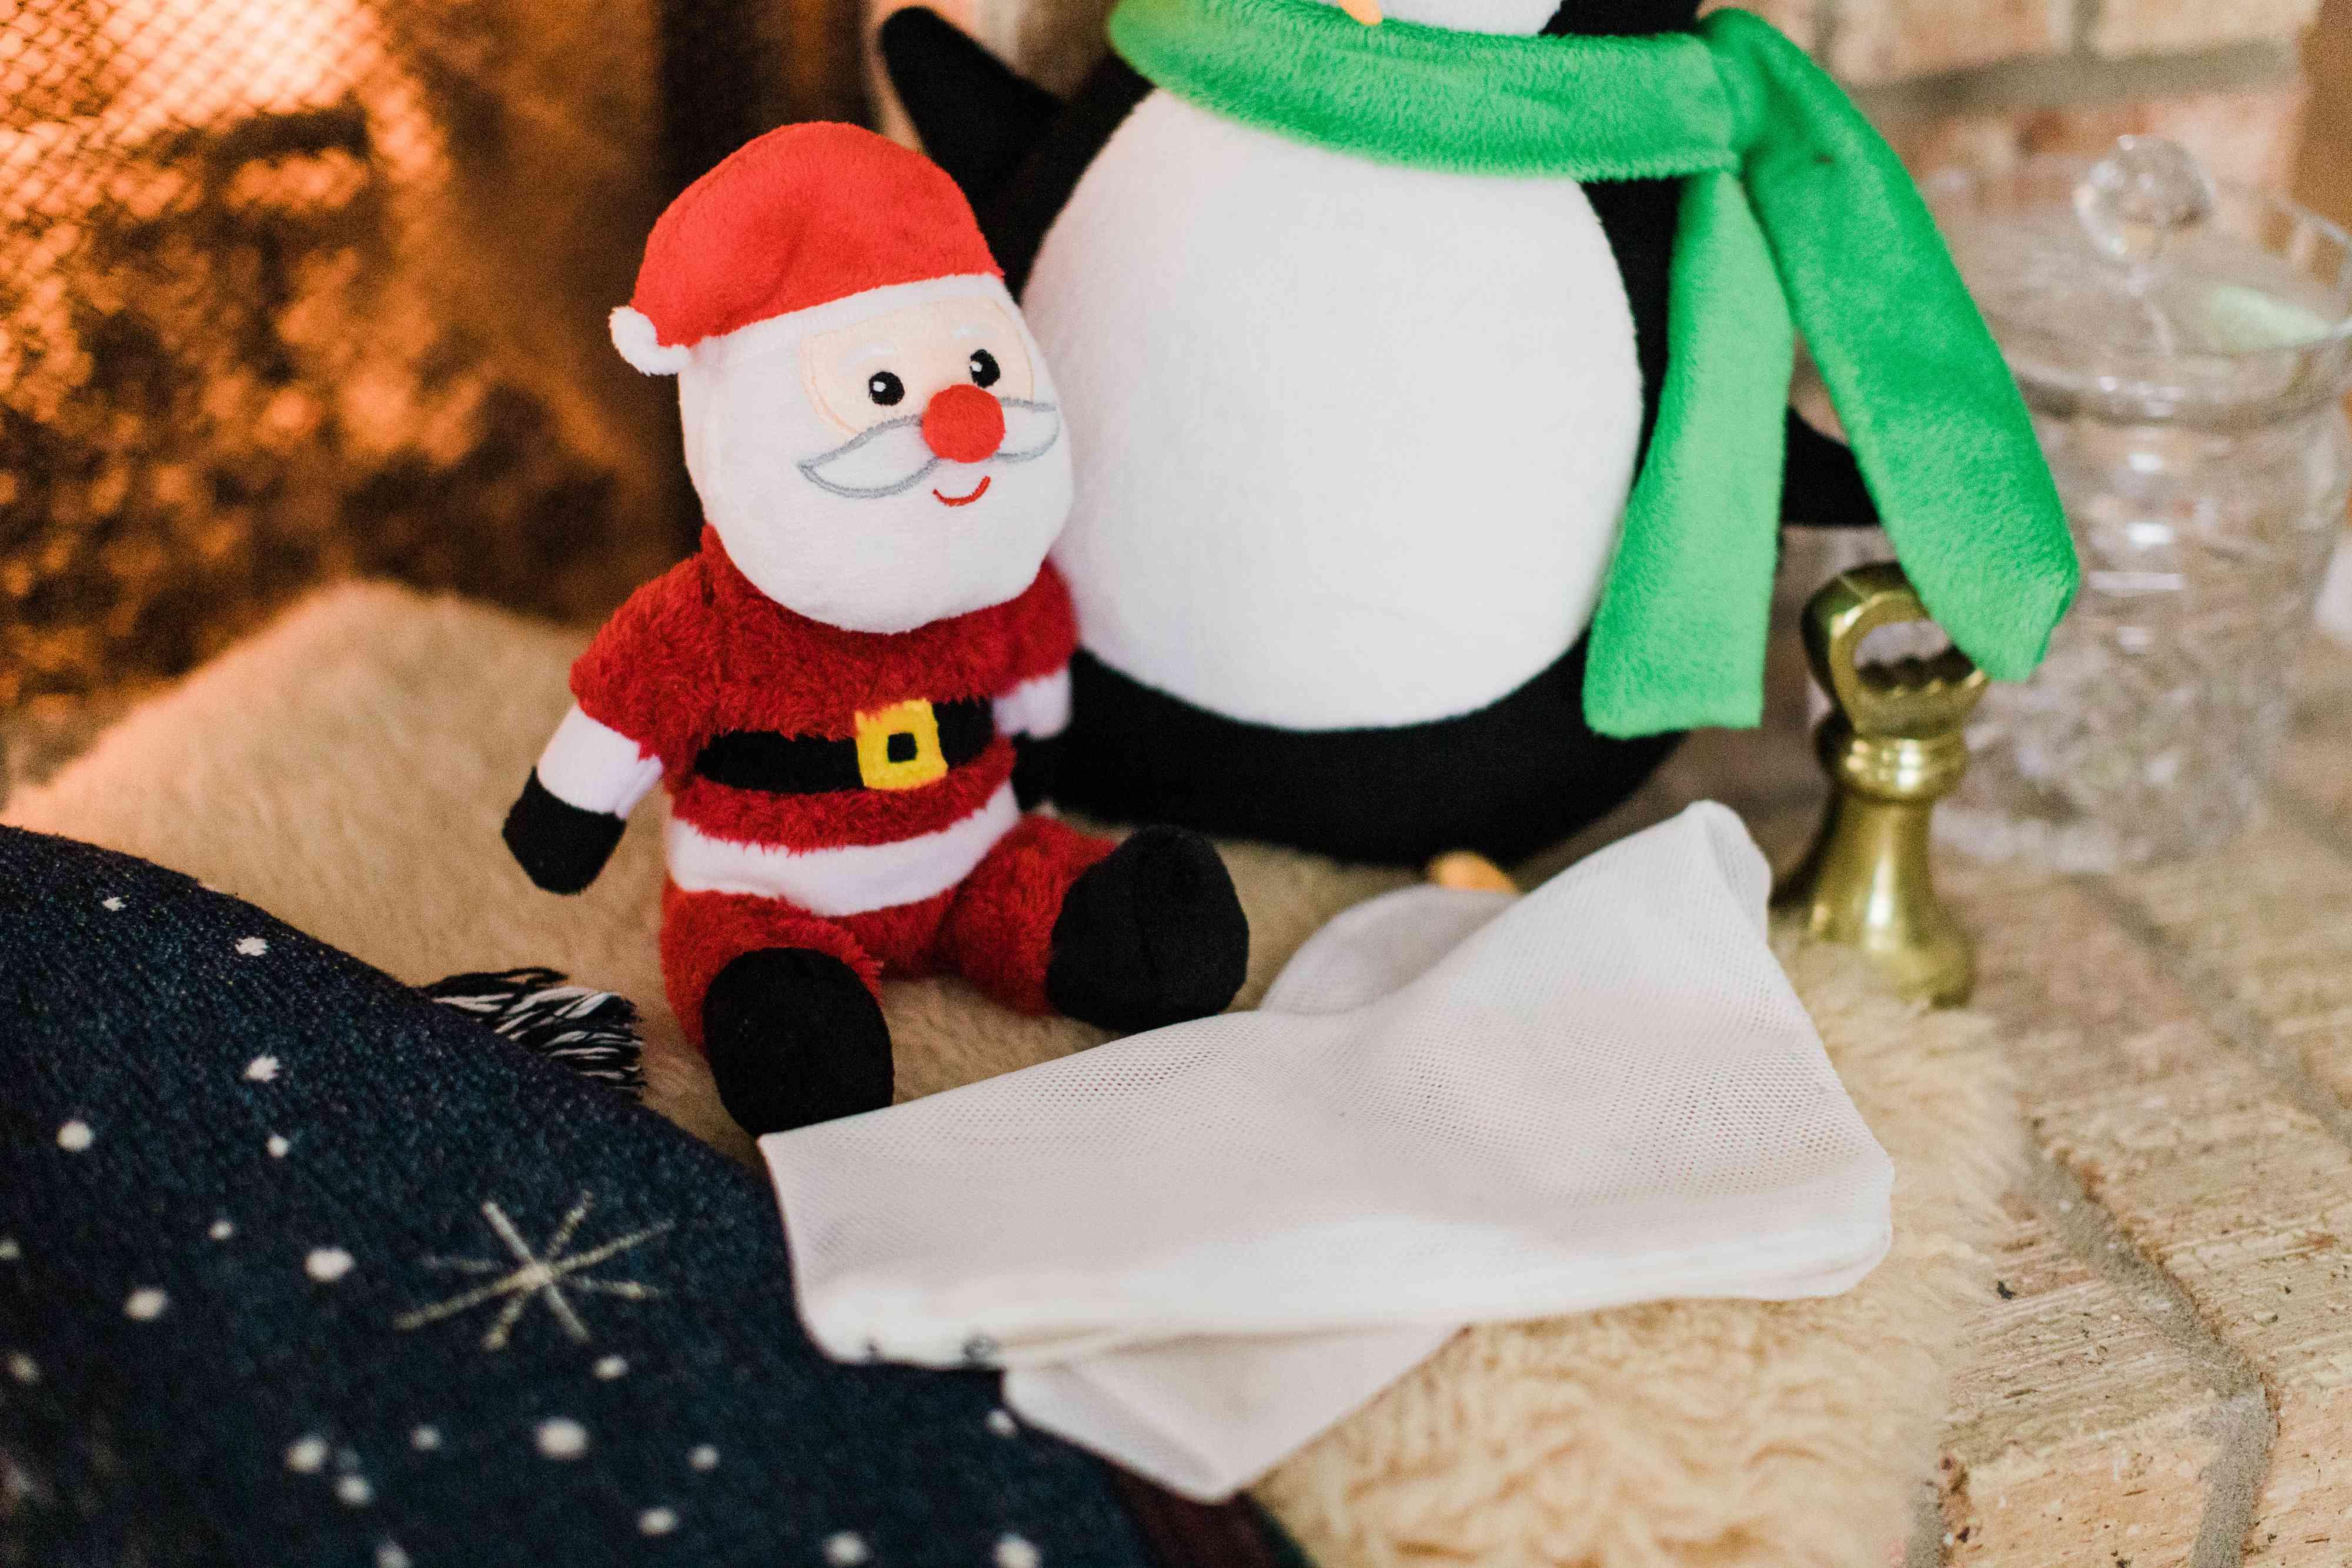 Holiday plush toys behind a folded mesh laundry bag